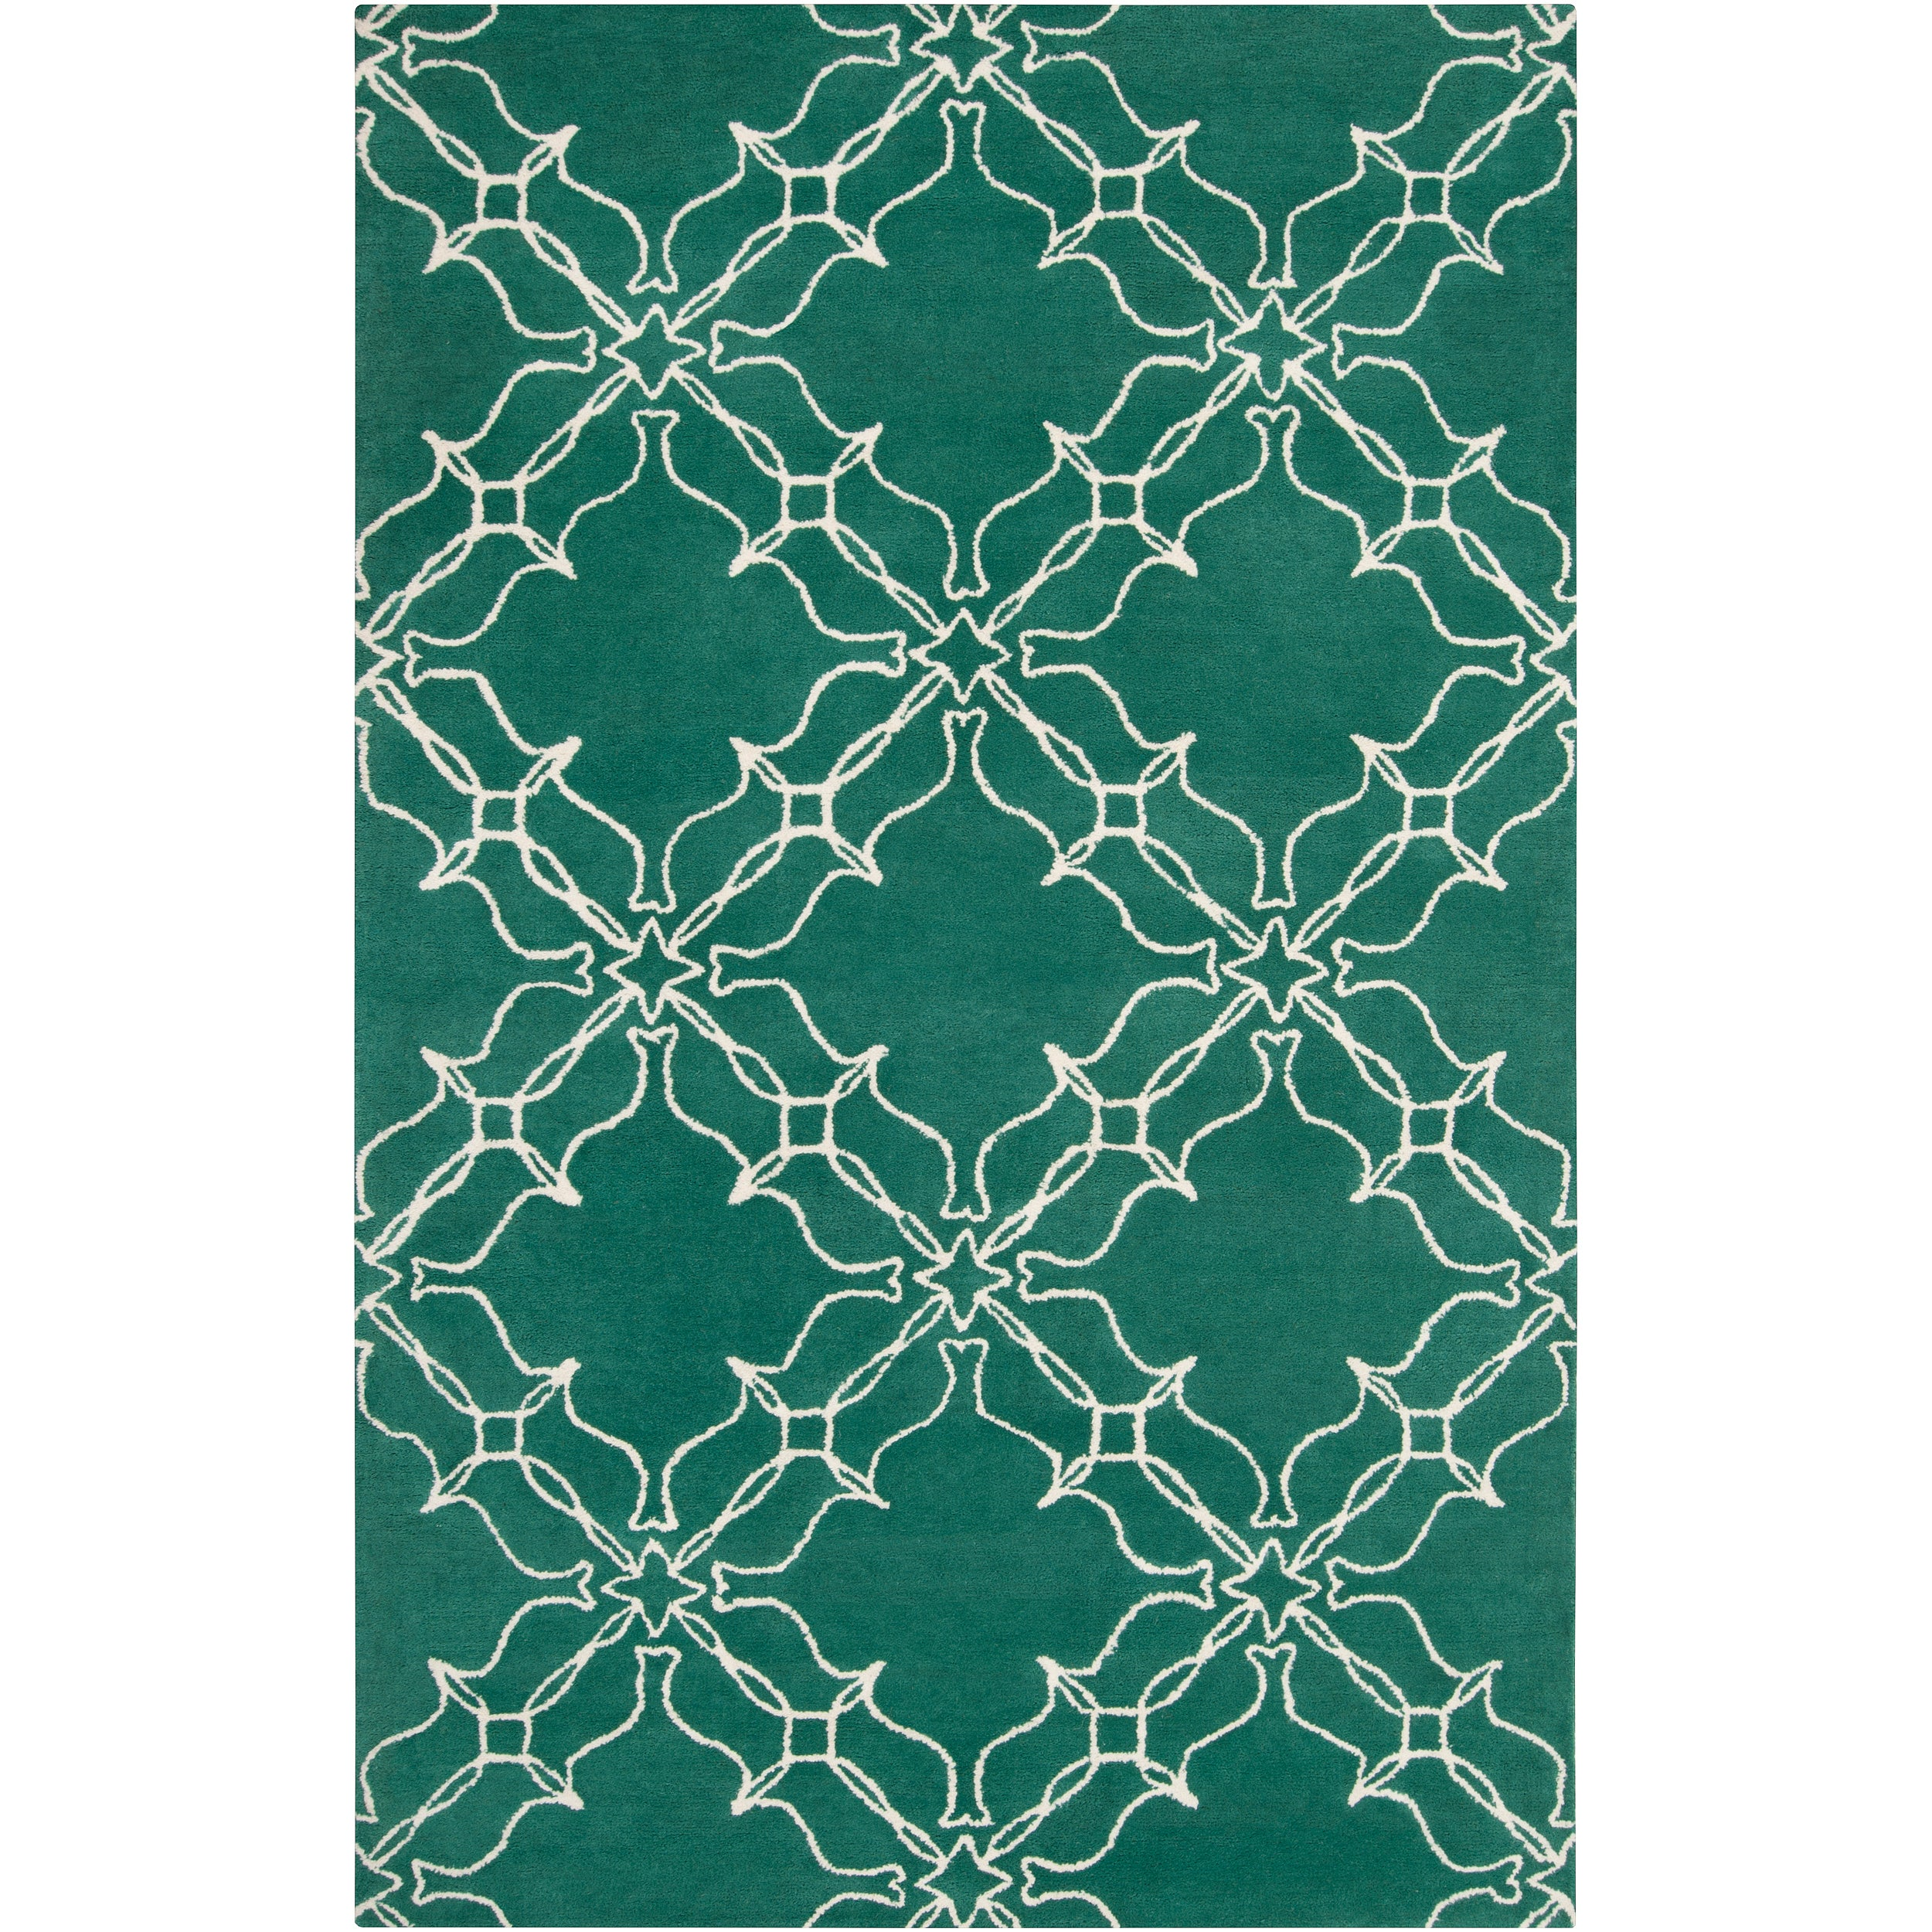 Aimee Wilder Hand-tufted Granada Emerald Green Geometric Trellis Wool Rug (2' x 3')